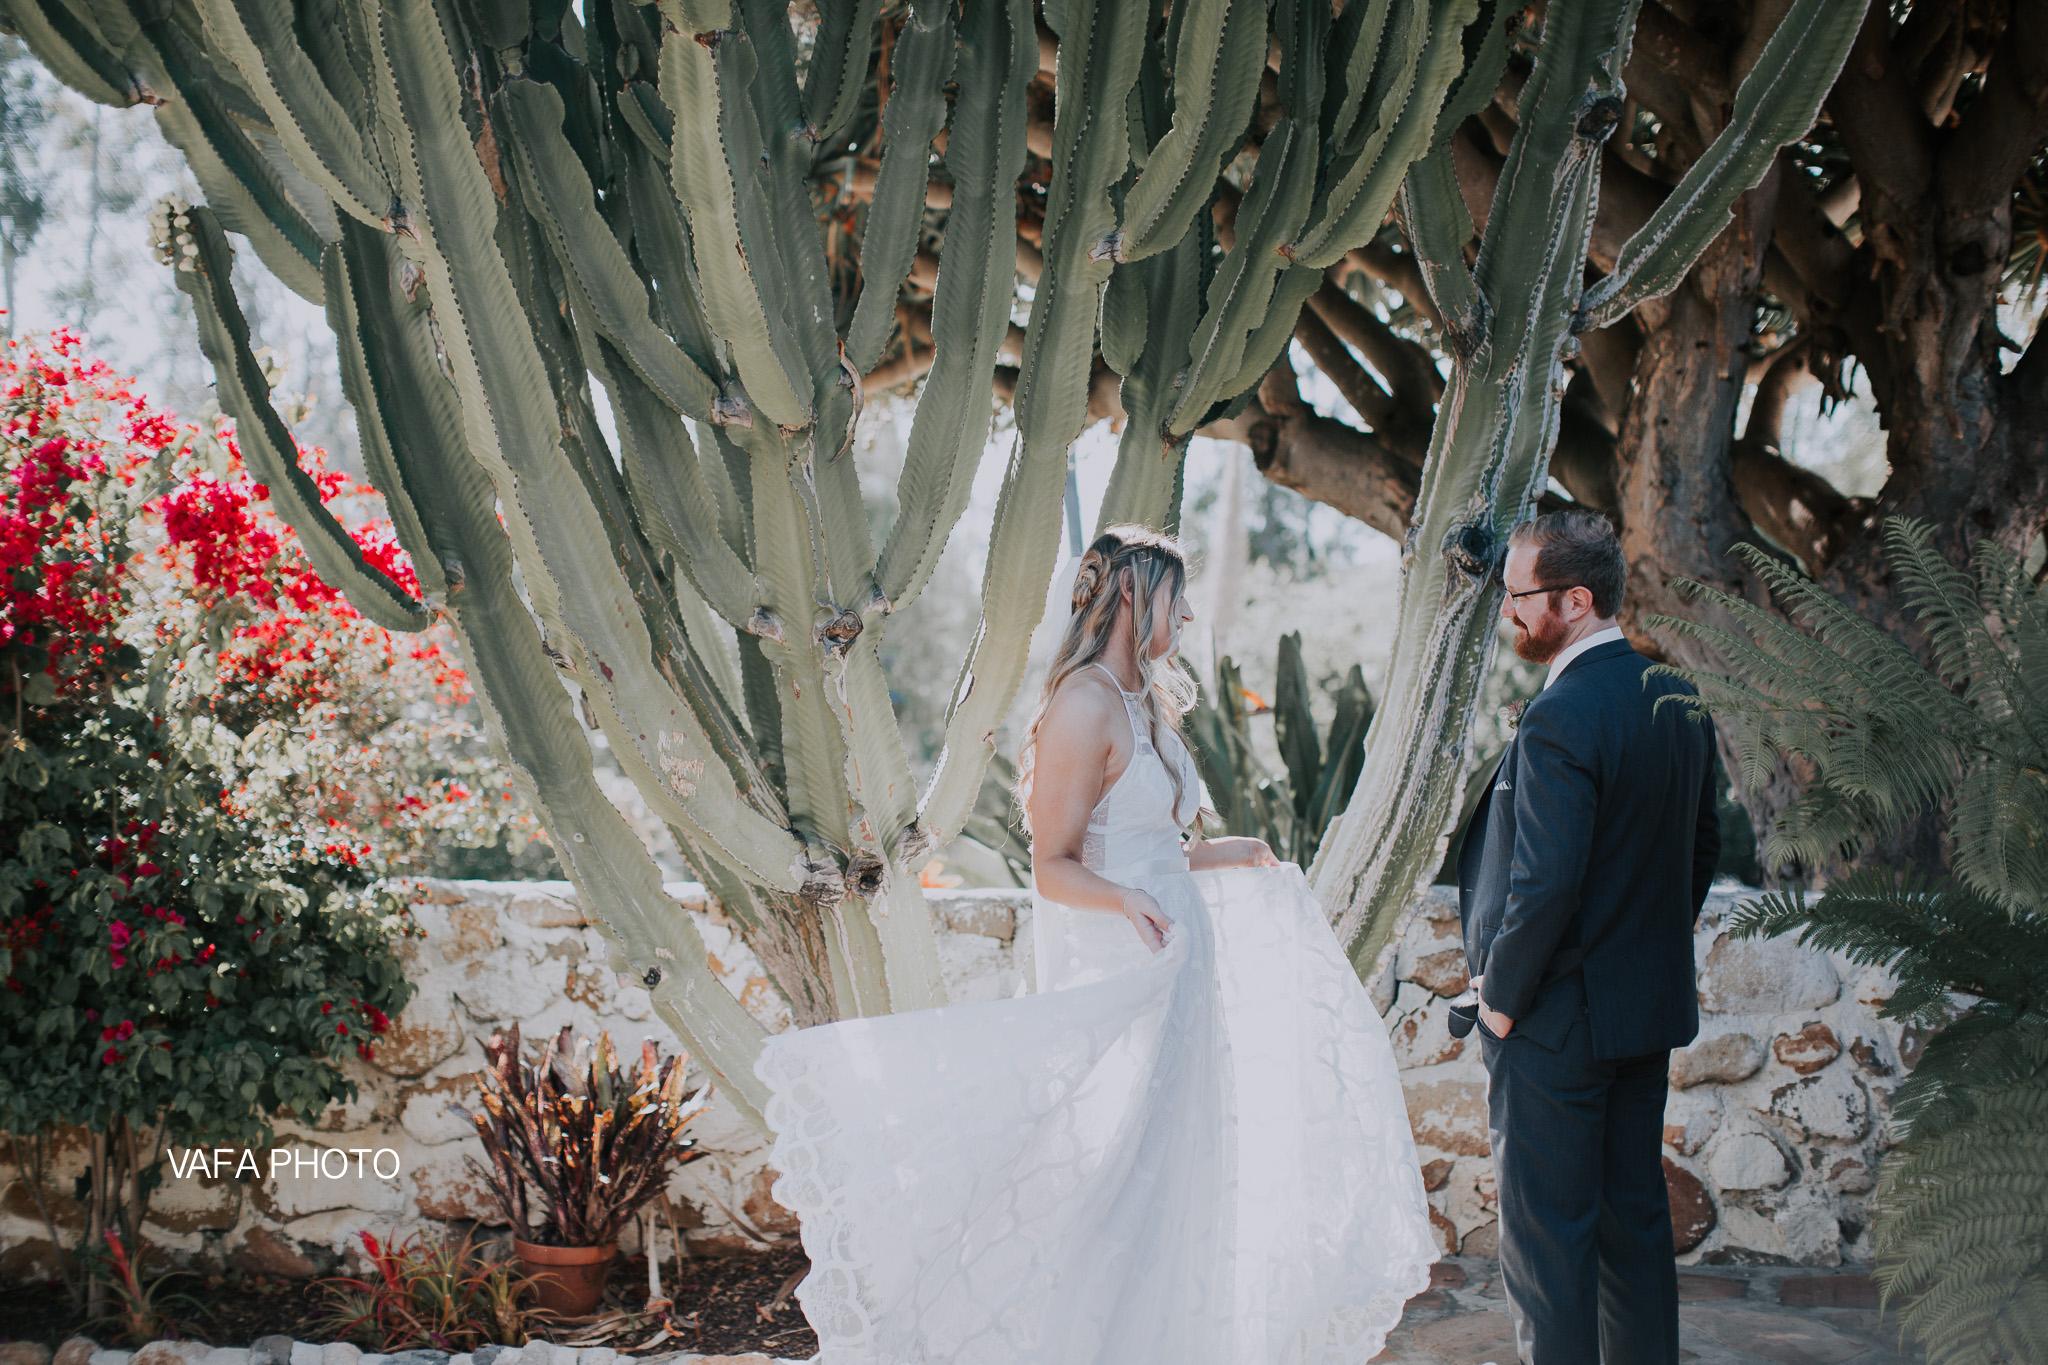 Leo-Carrillo-Ranch-Wedding-Lauren-Mike-Vafa-Photo-292.jpg